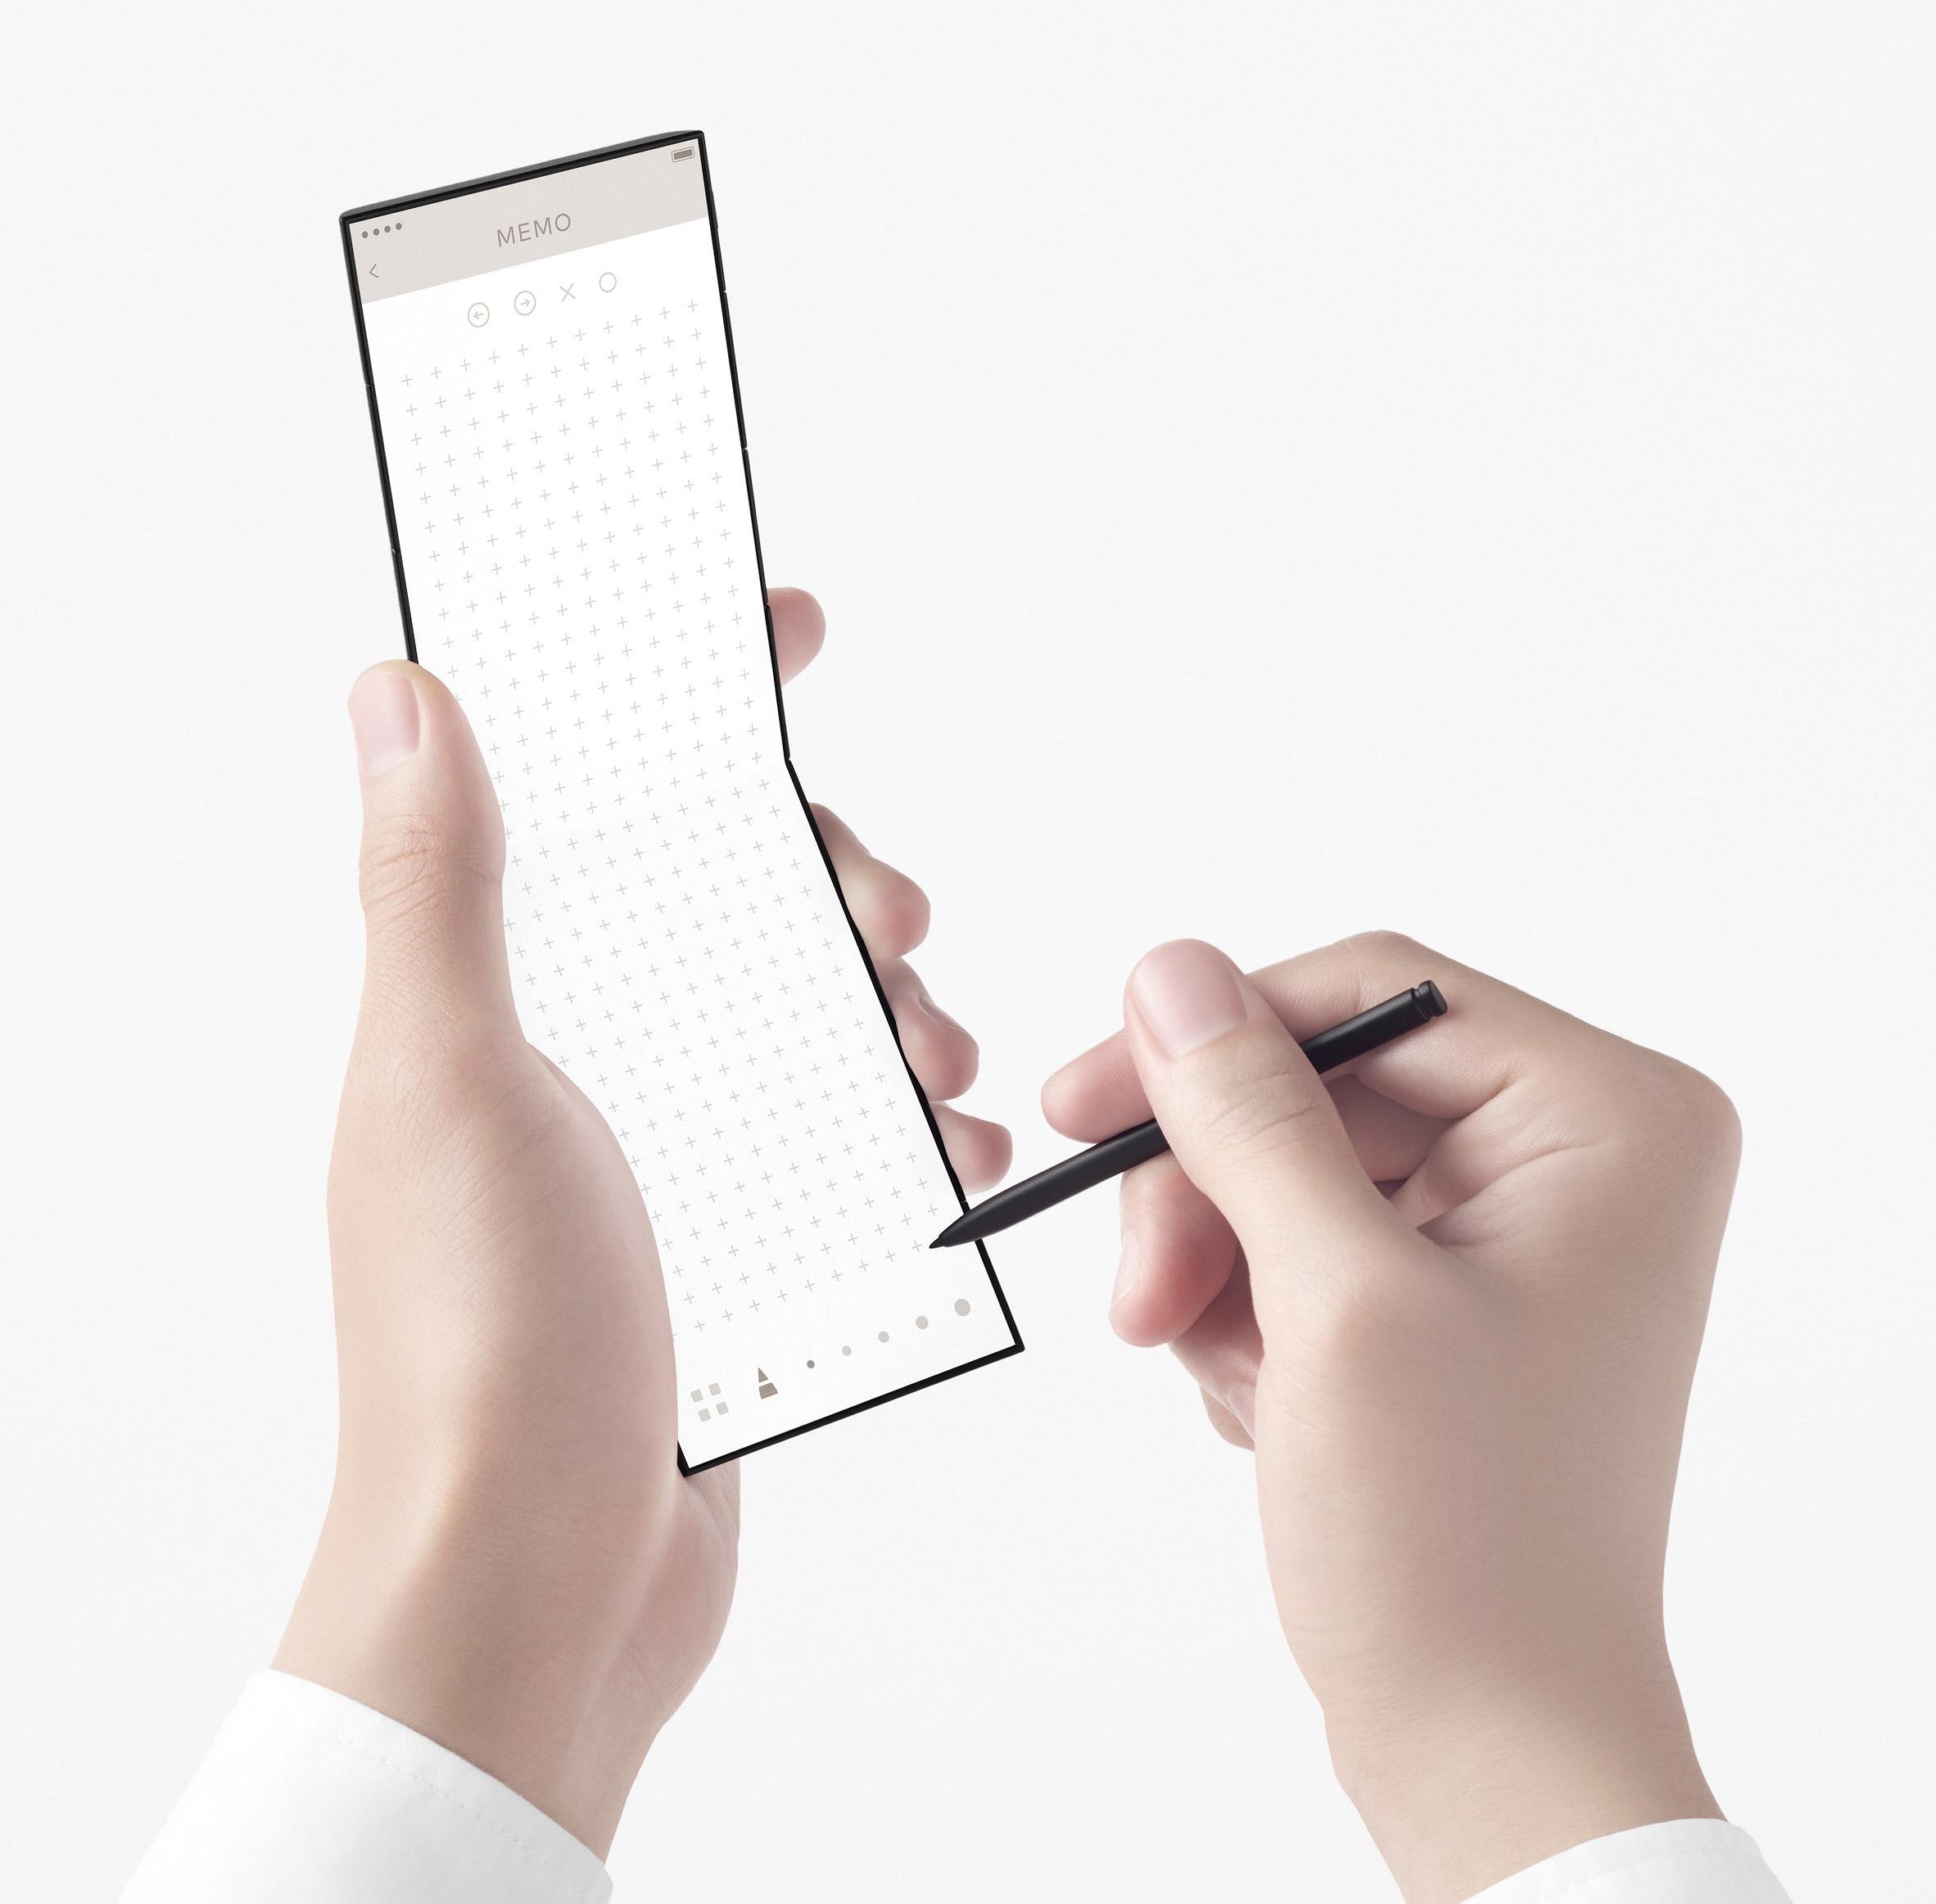 nendo-slide-phone-concept-design_dezeen_2364_col_7